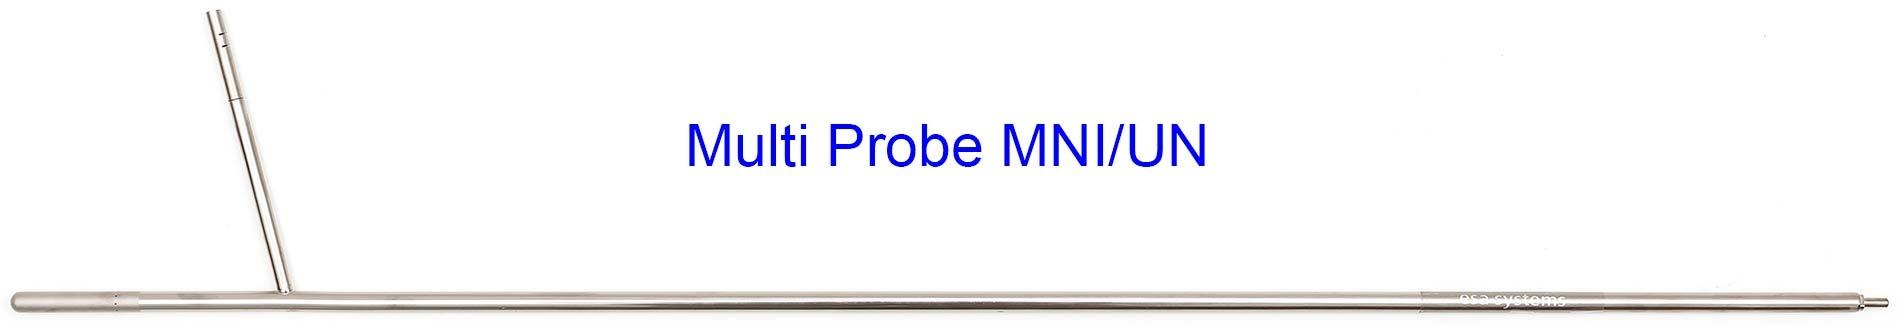 Mulit Probe MNI/UN